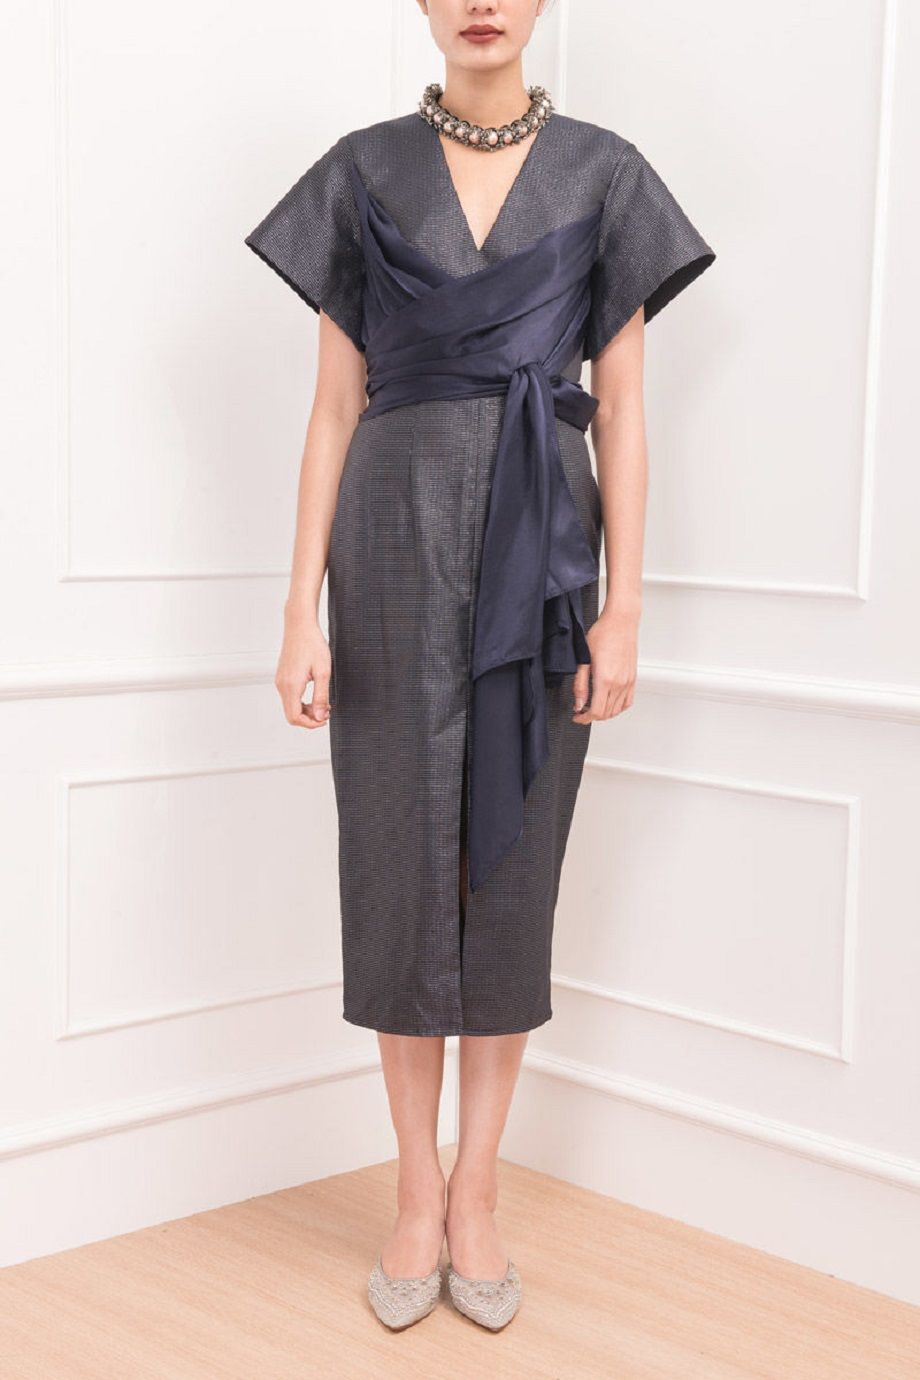 #PopbelaOOTD: Siap Party Setelah Kantor dengan 5 Fashion Item Ini